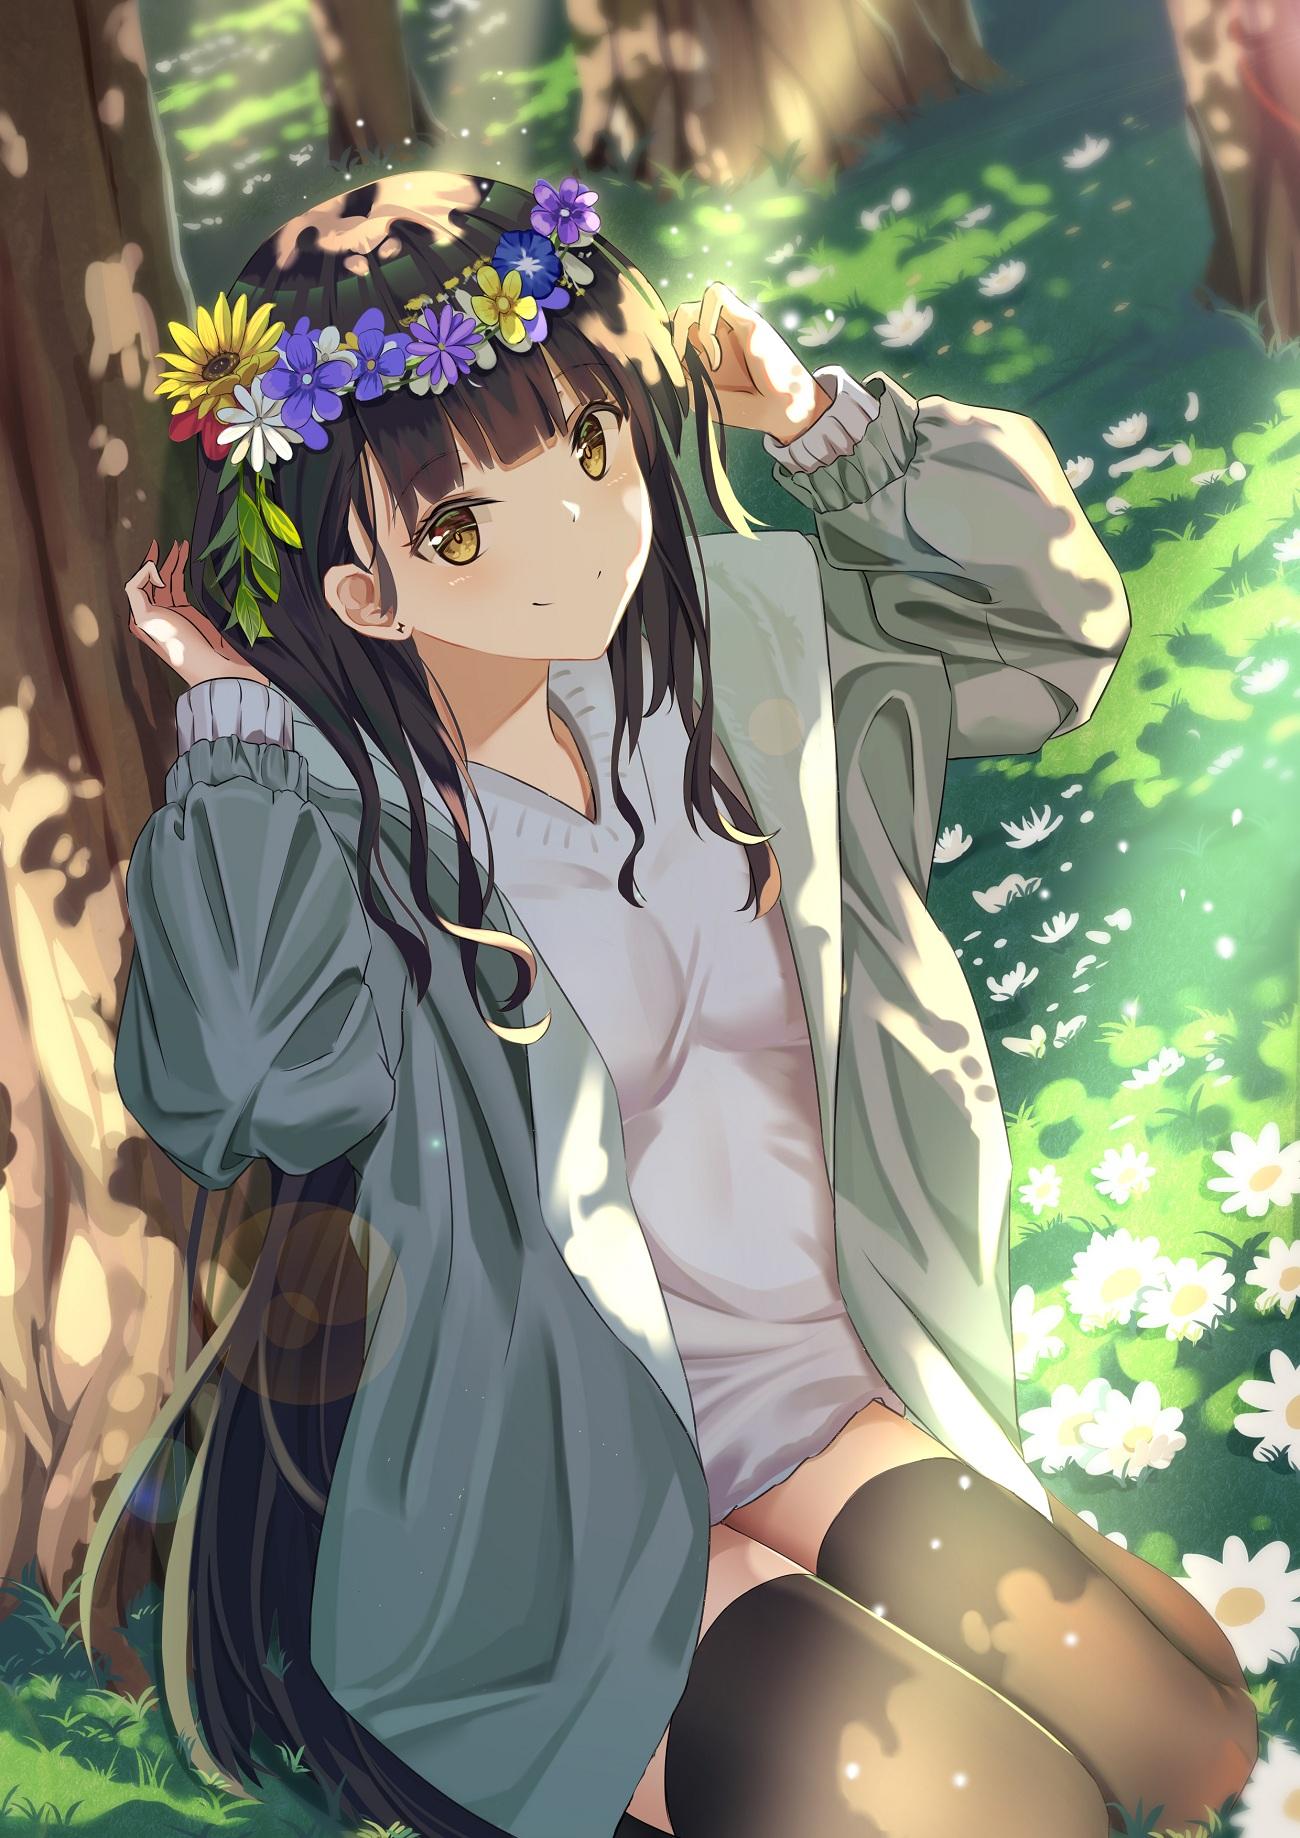 Wallpaper : anime girls, original characters, flower crown ...